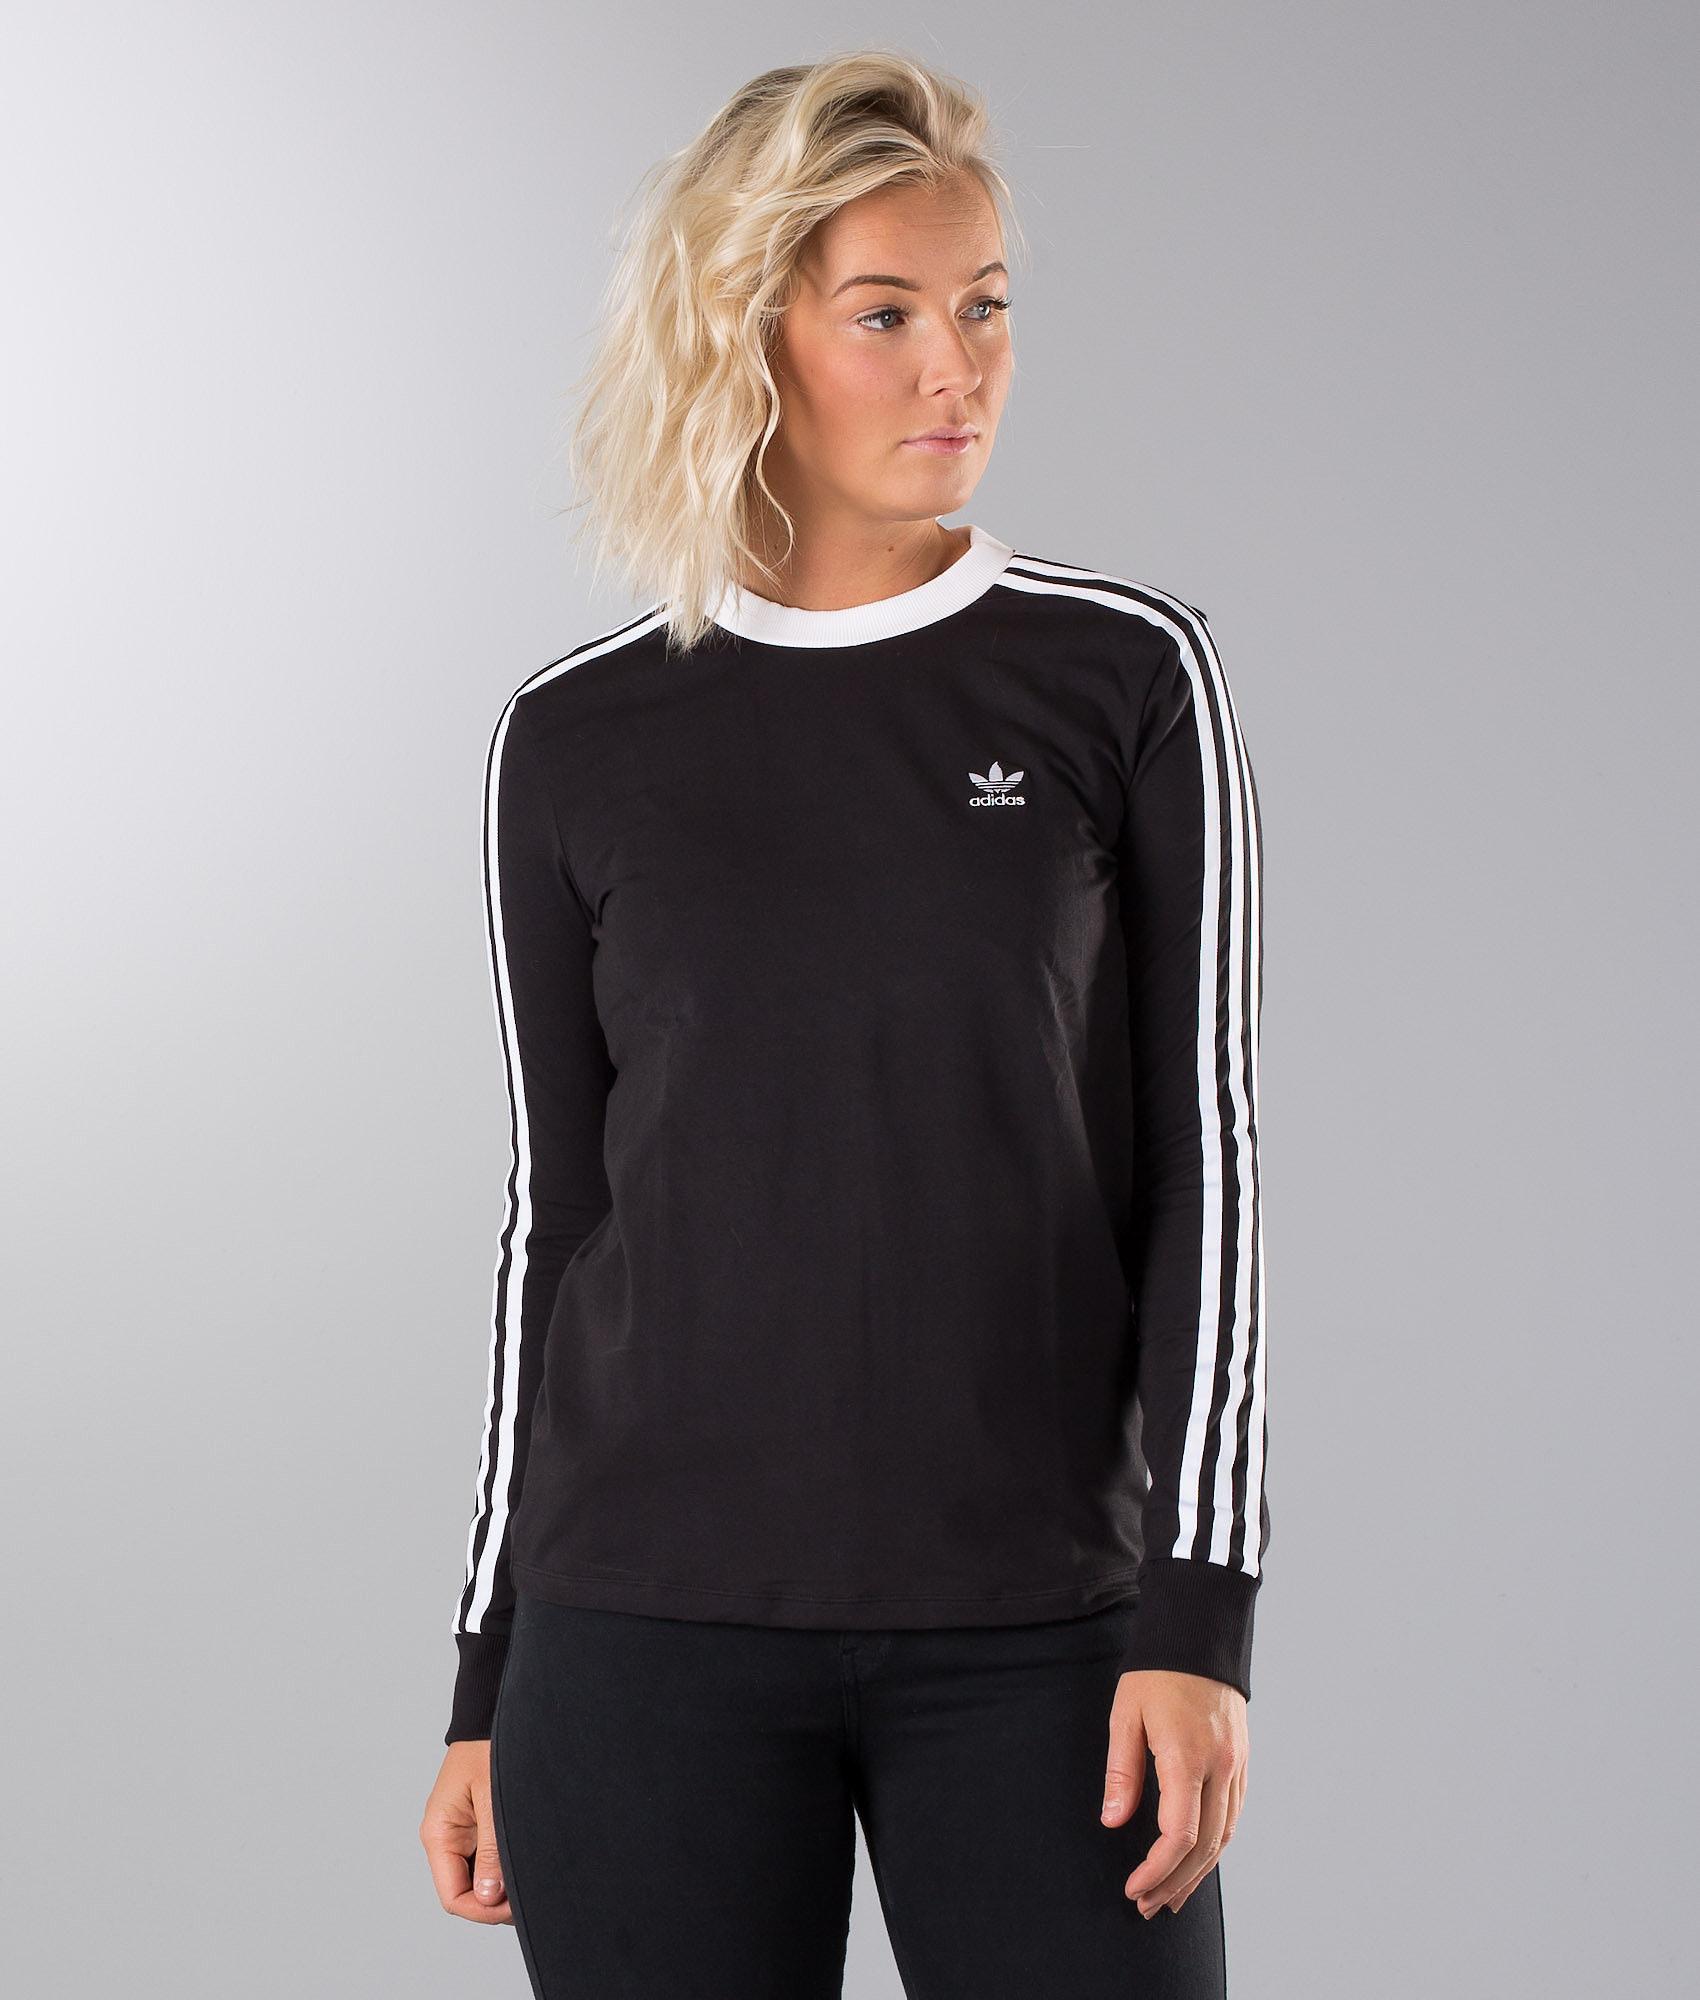 2be68362f3c Adidas Originals | Buy Online | Free Delivery | RIDESTORE